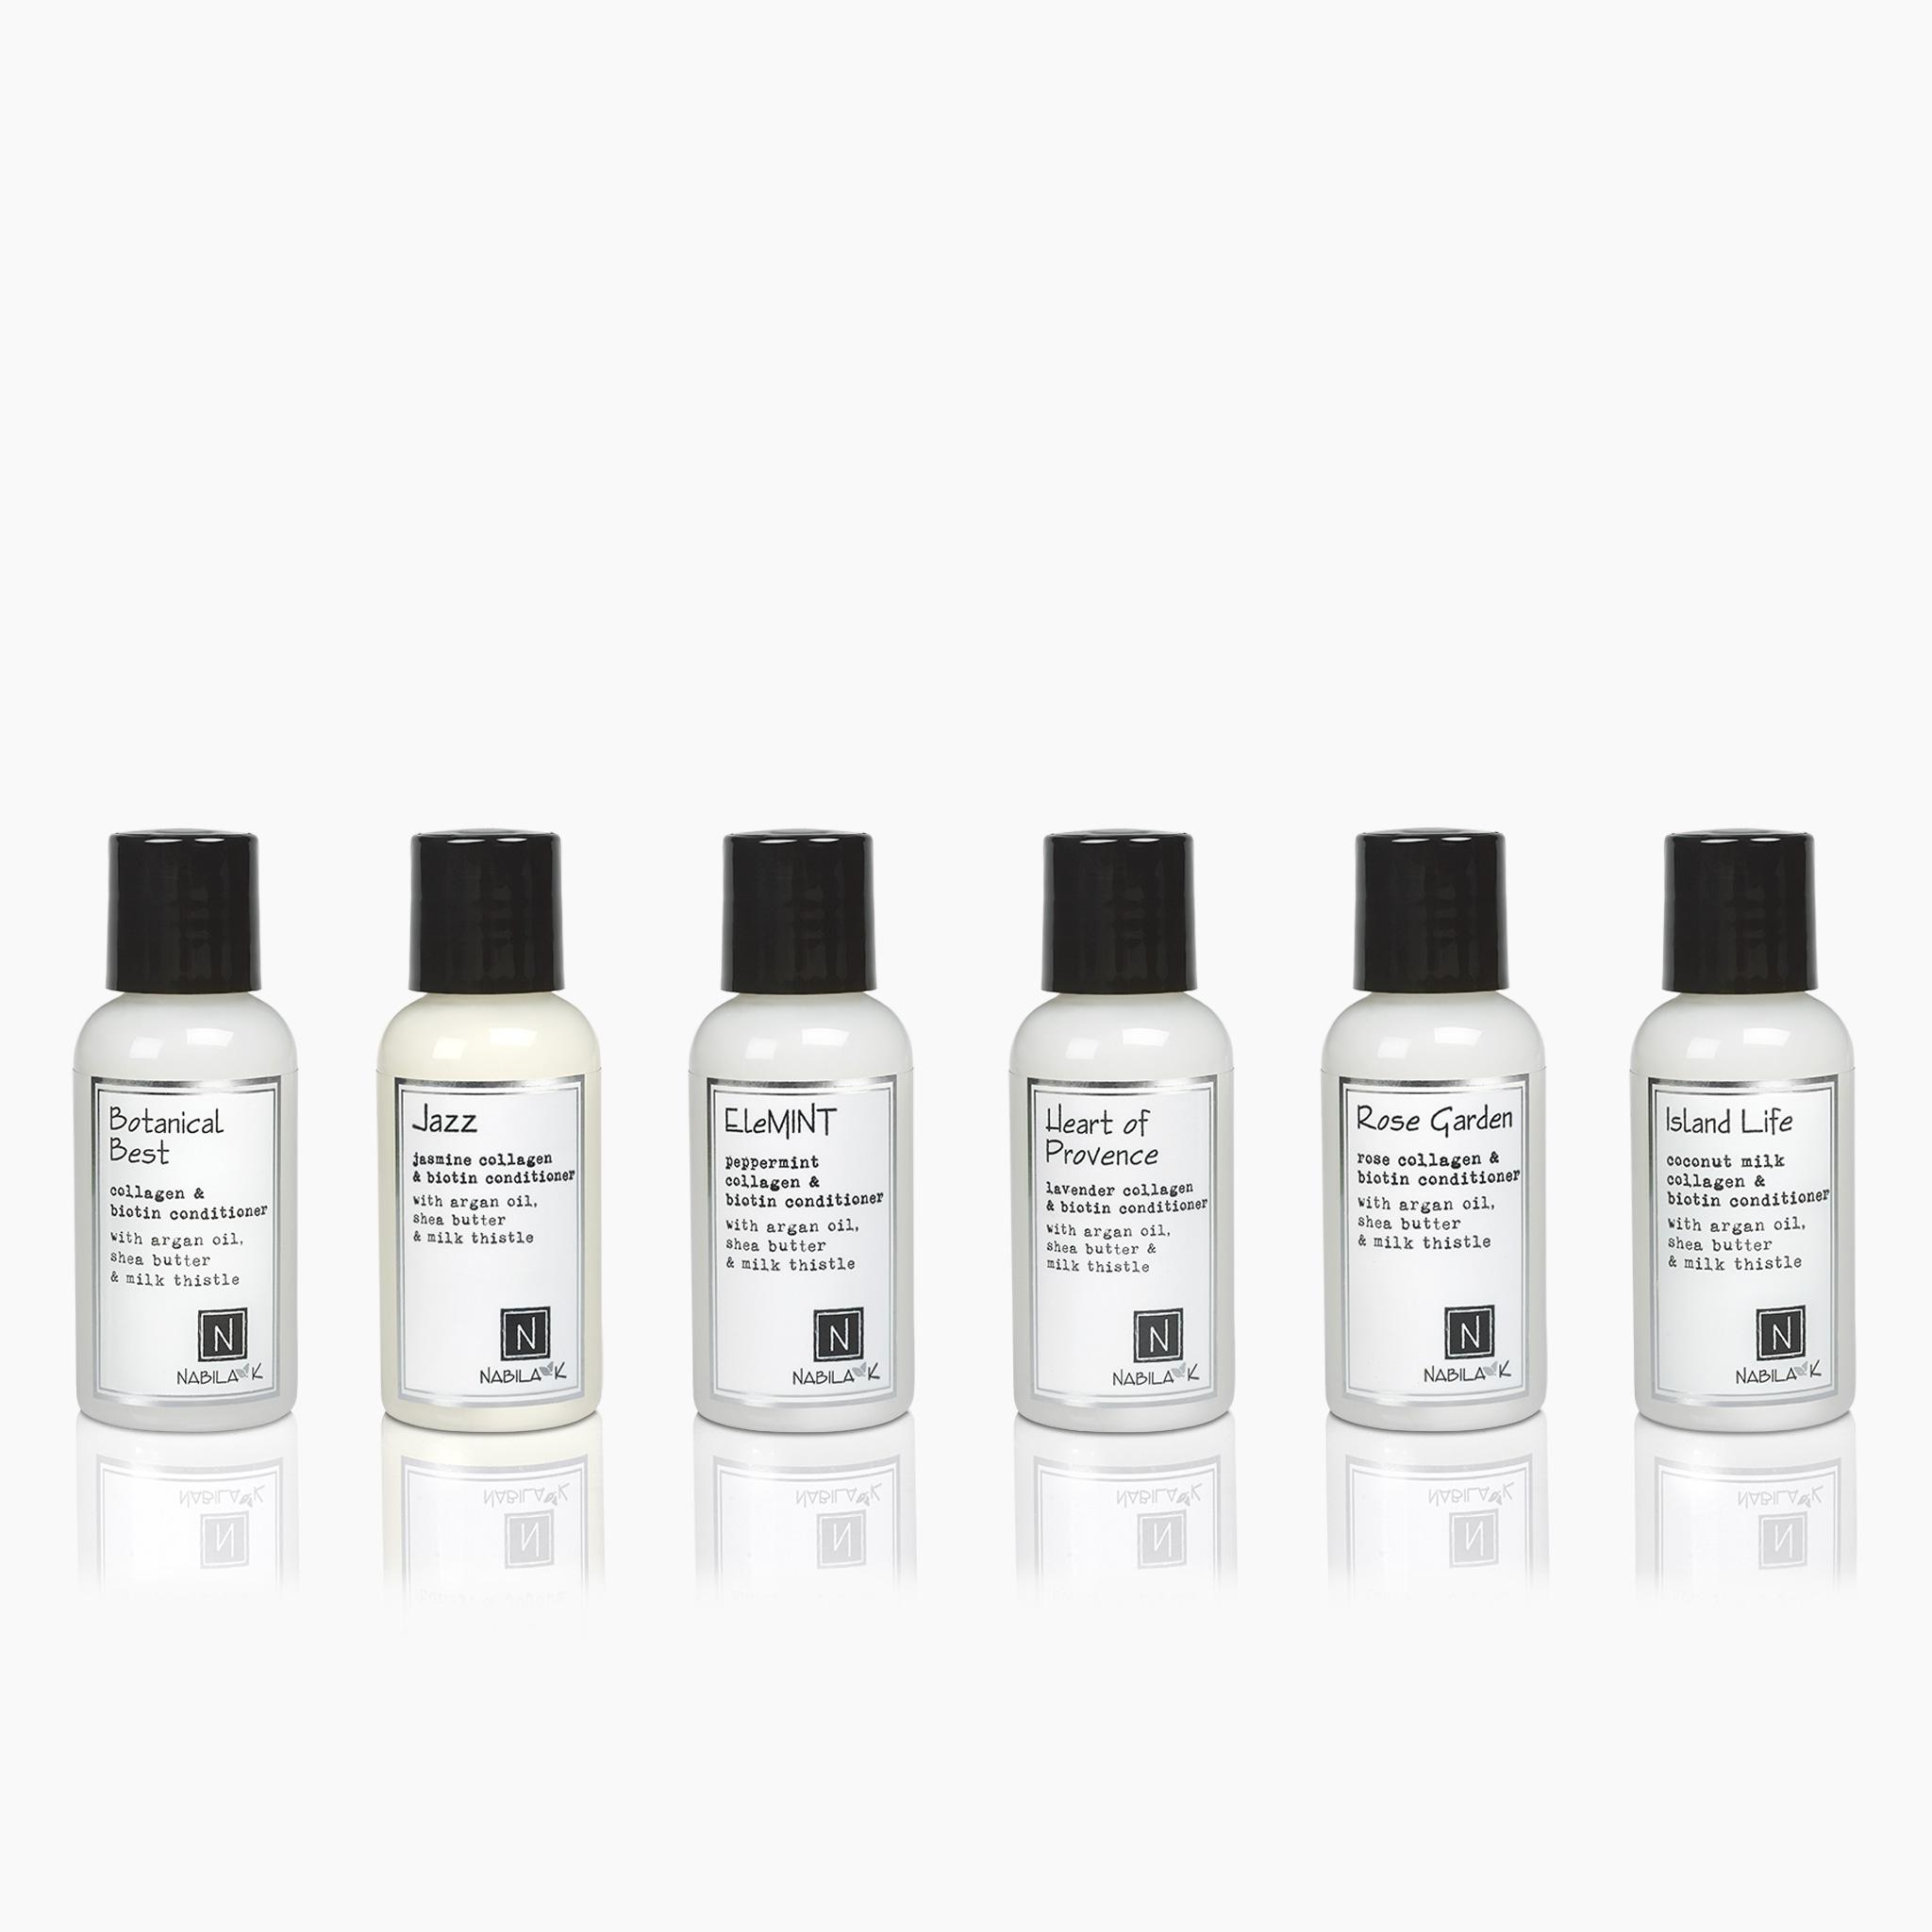 6 Travel Sized Bottles of Nabila K's Collagen and Biotin Conditioner